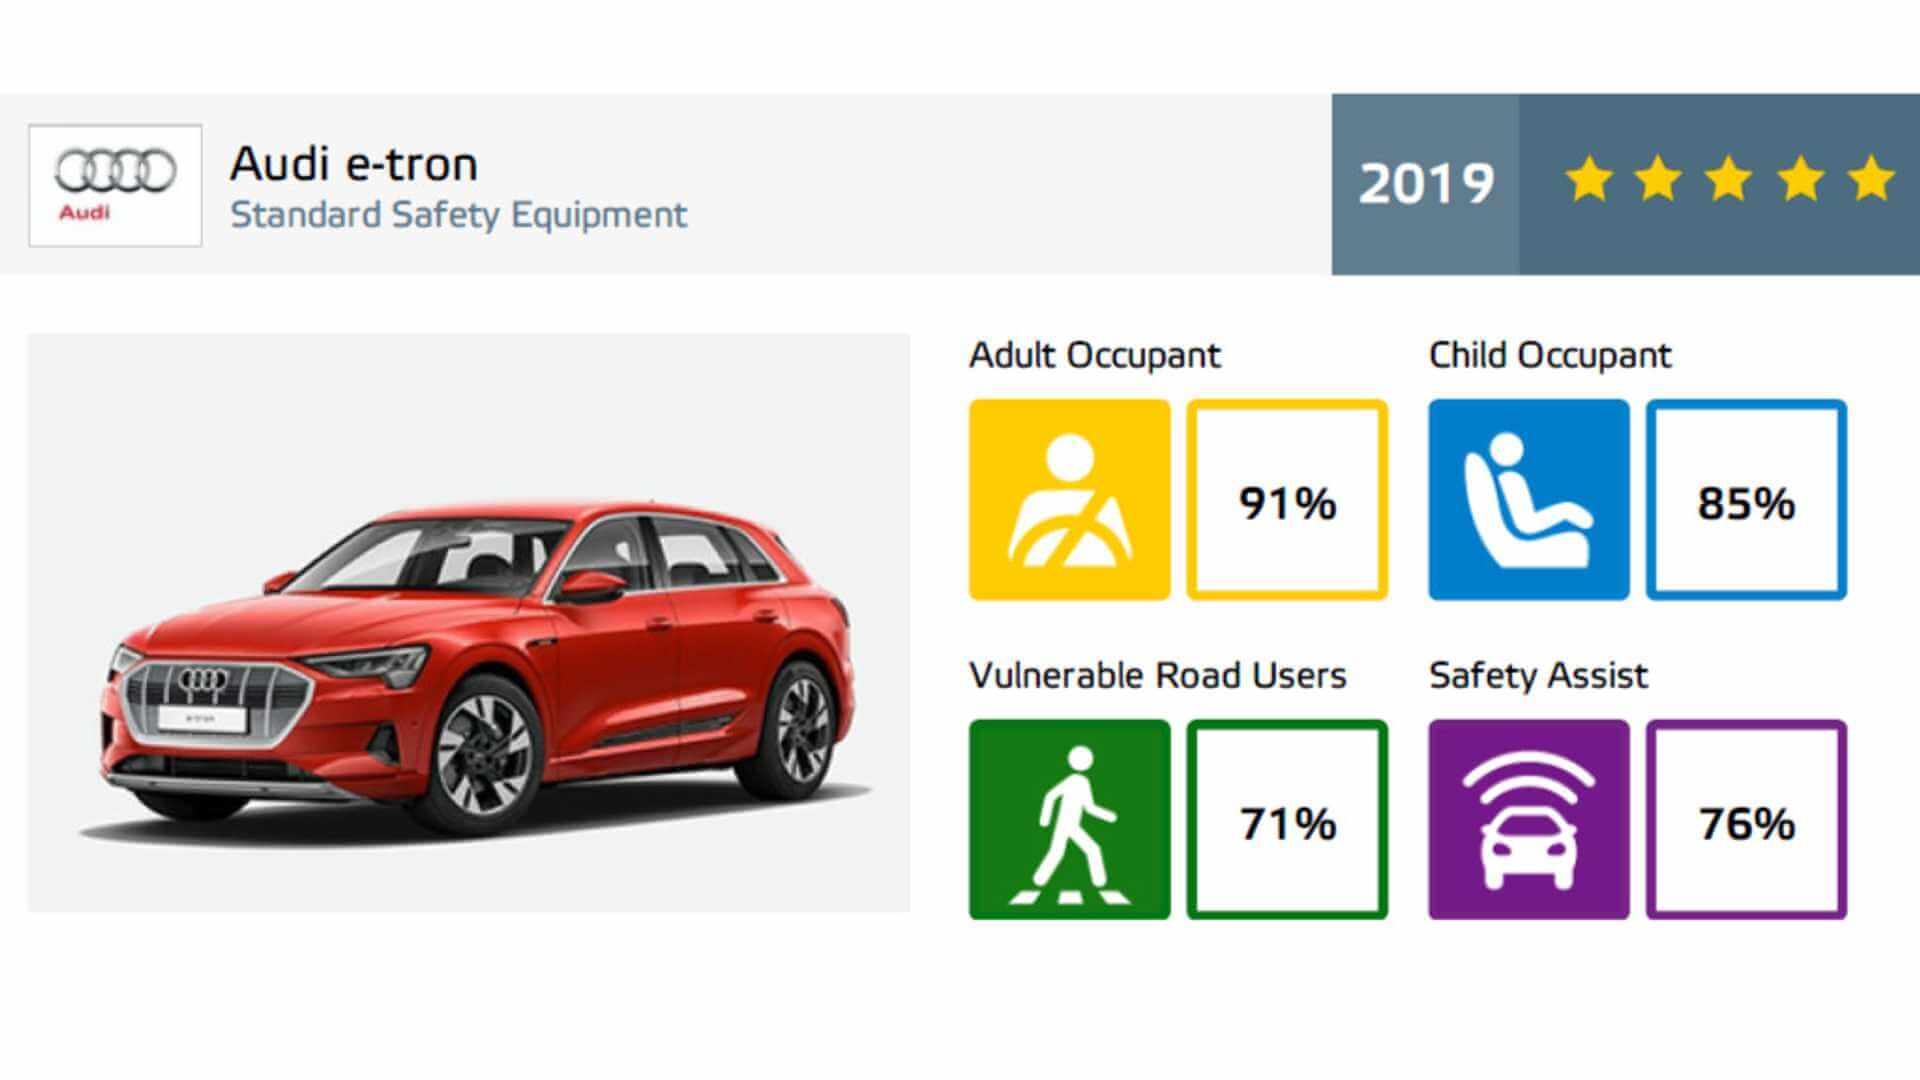 Audi e-tron quattroполучил 5звезд ирейтинг в91% отEuro NCAP